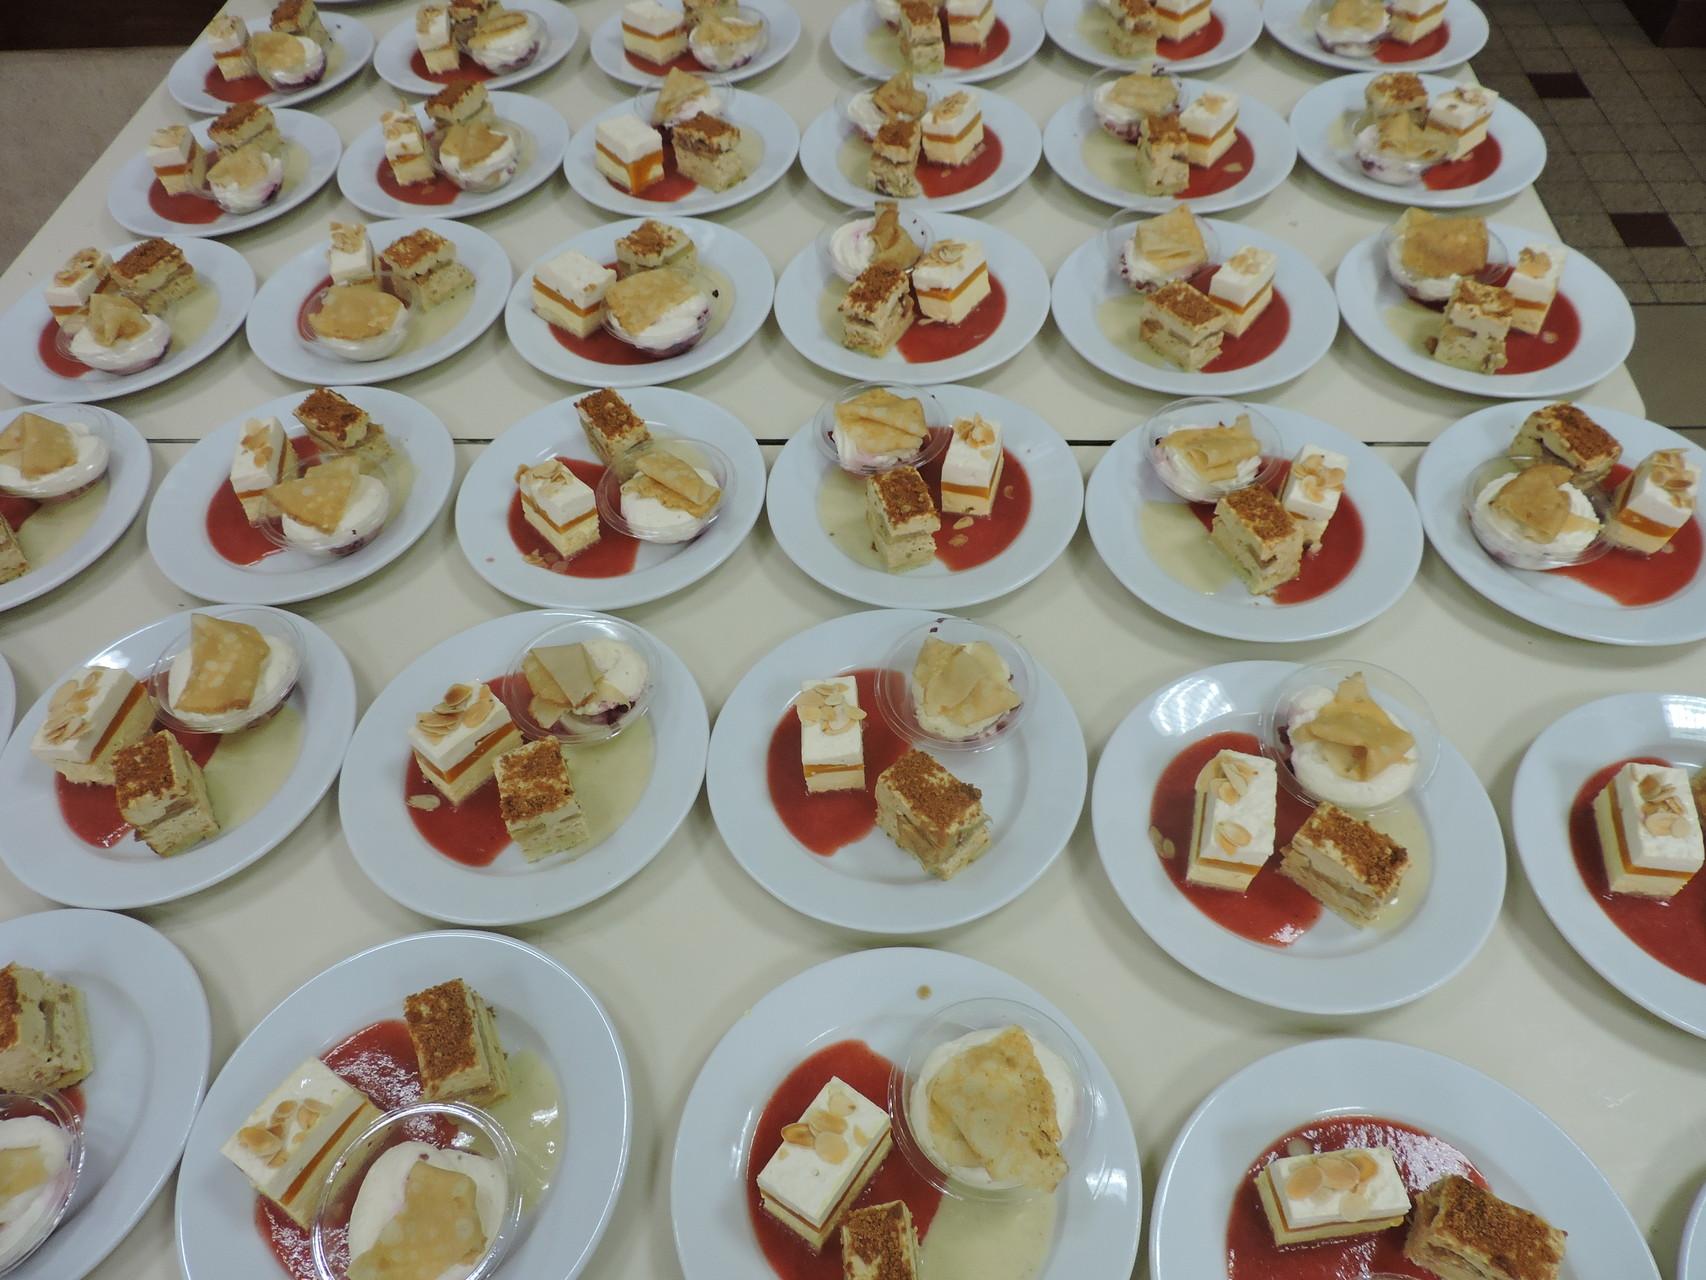 Petite trilogie de desserts .... en version multiple !!!